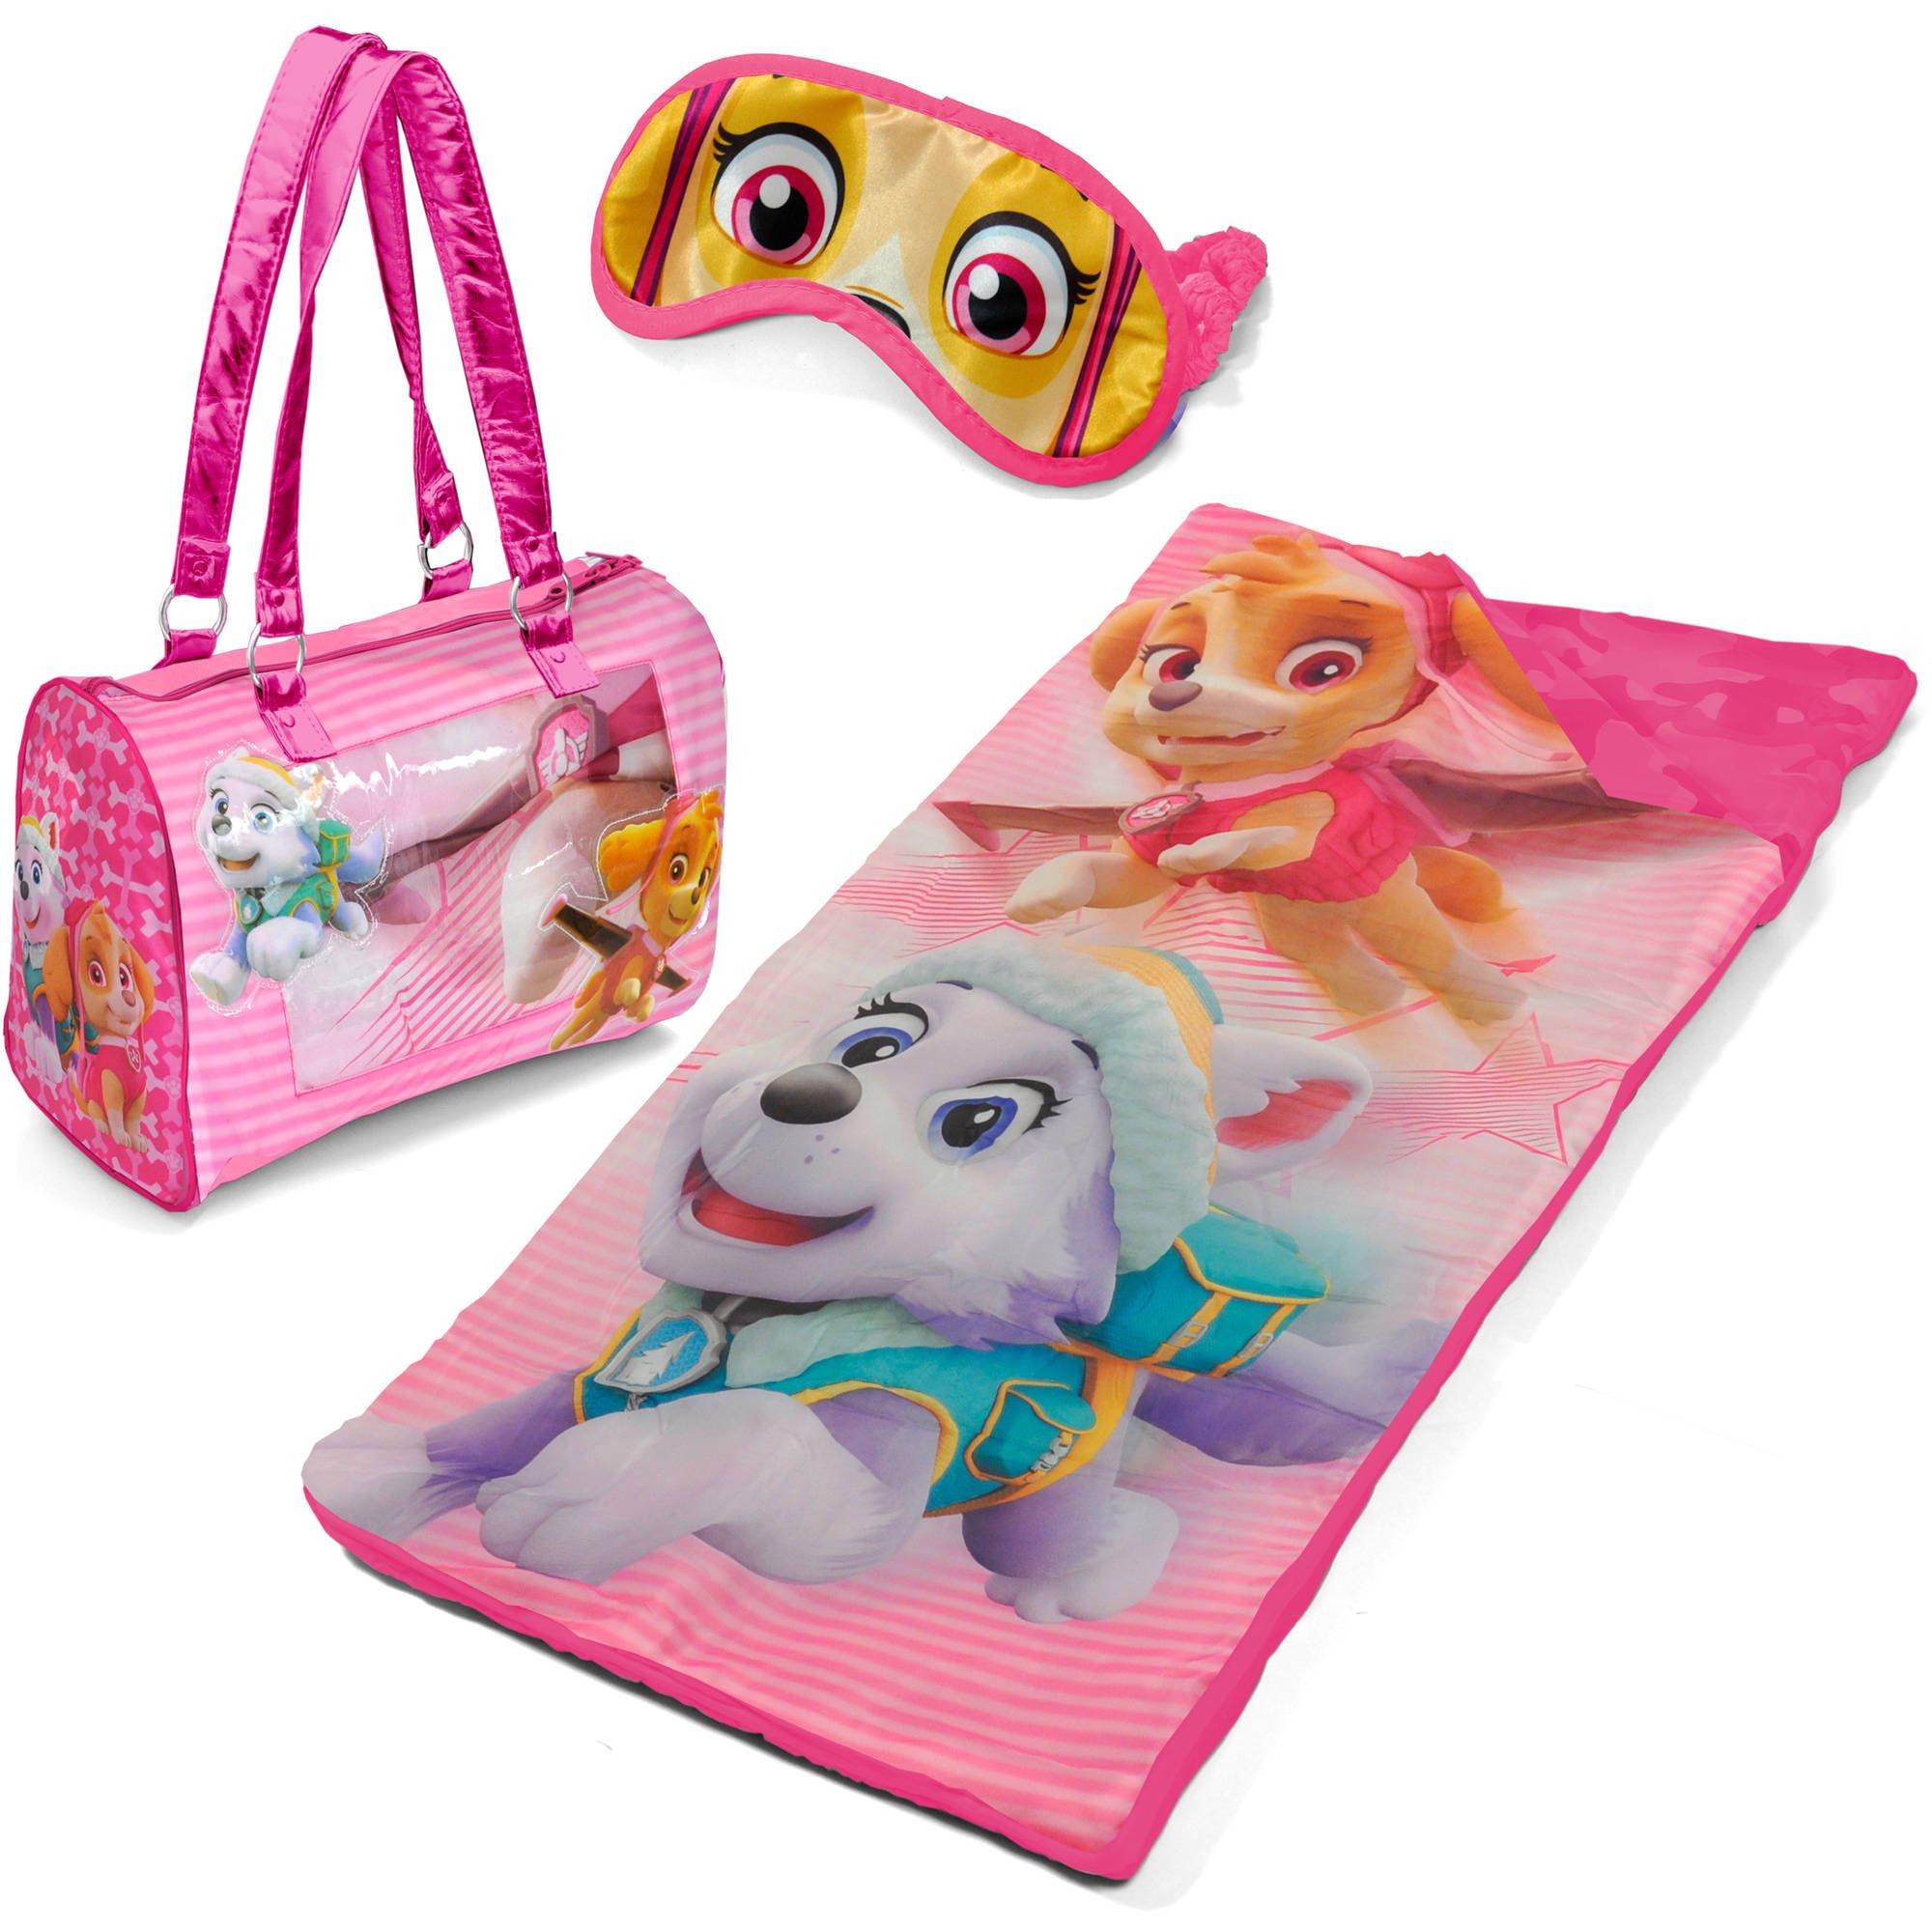 Kids Paw Patrol Sleepover 3 Piece Set with Sleeping bag, Purse Tote and Eye Mask